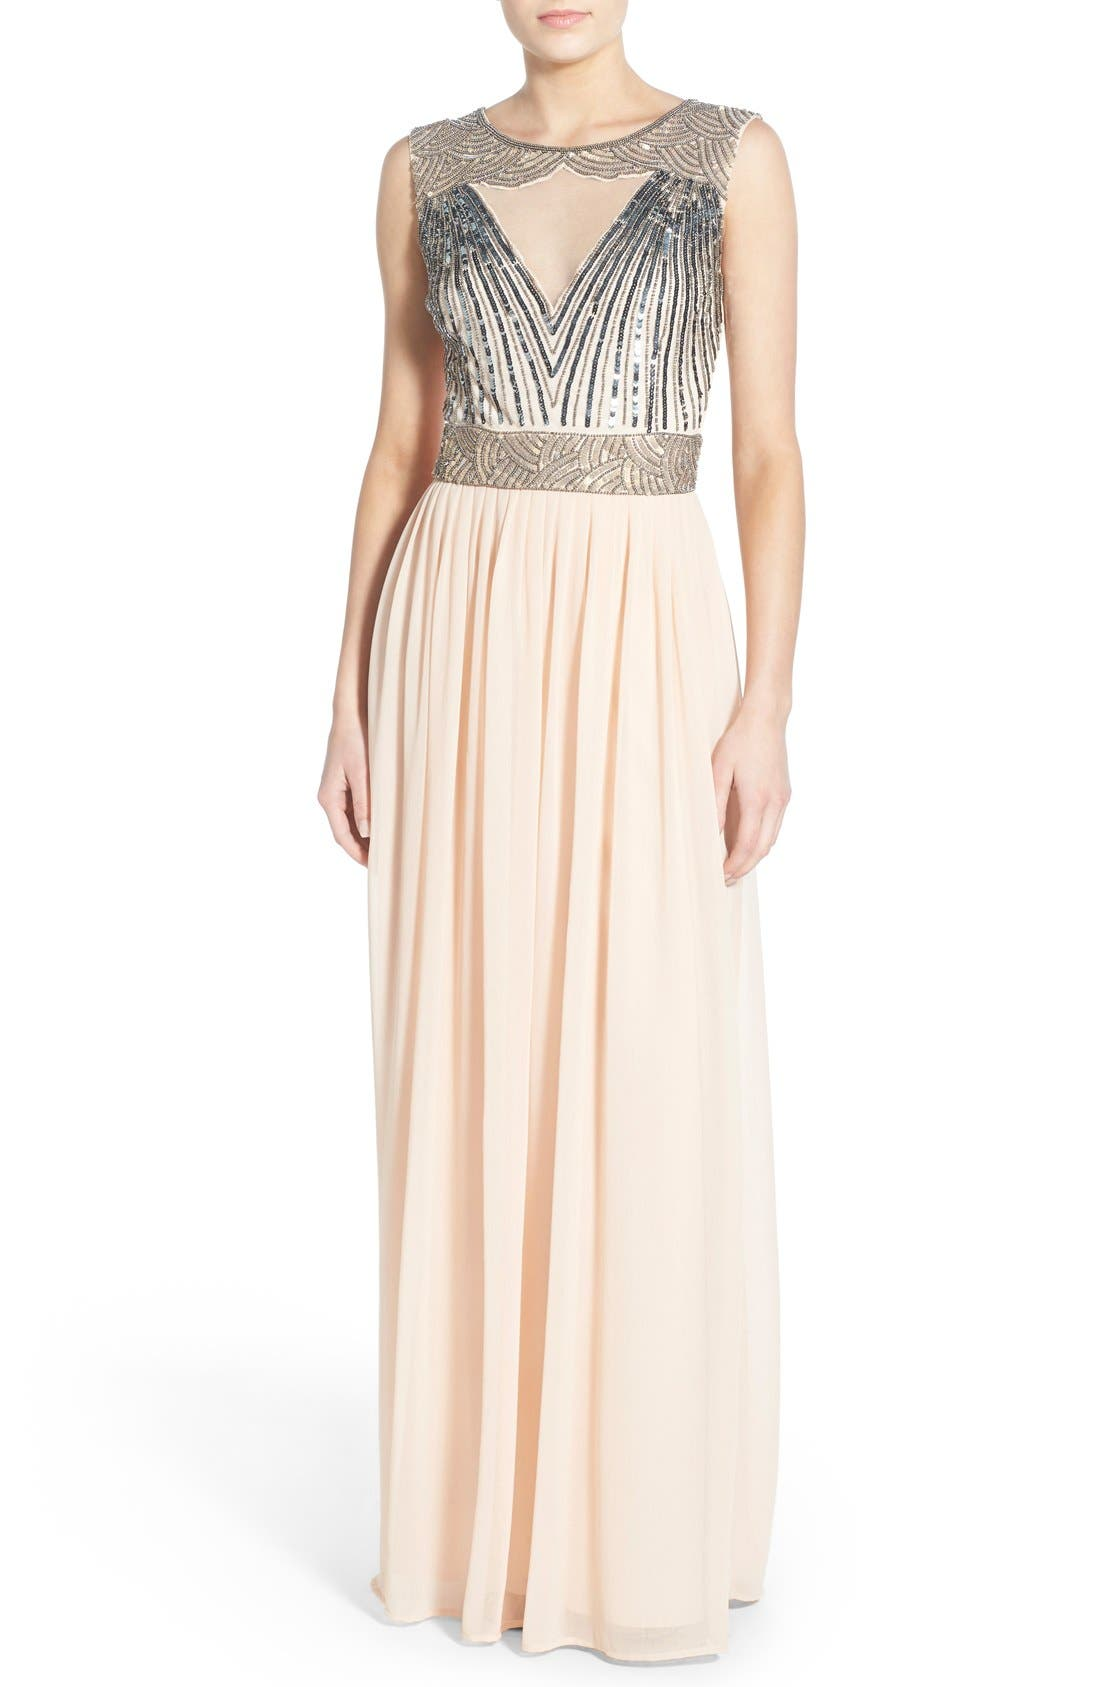 Alternate Image 1 Selected - Lace & Beads 'Tina' Embellished Maxi Dress